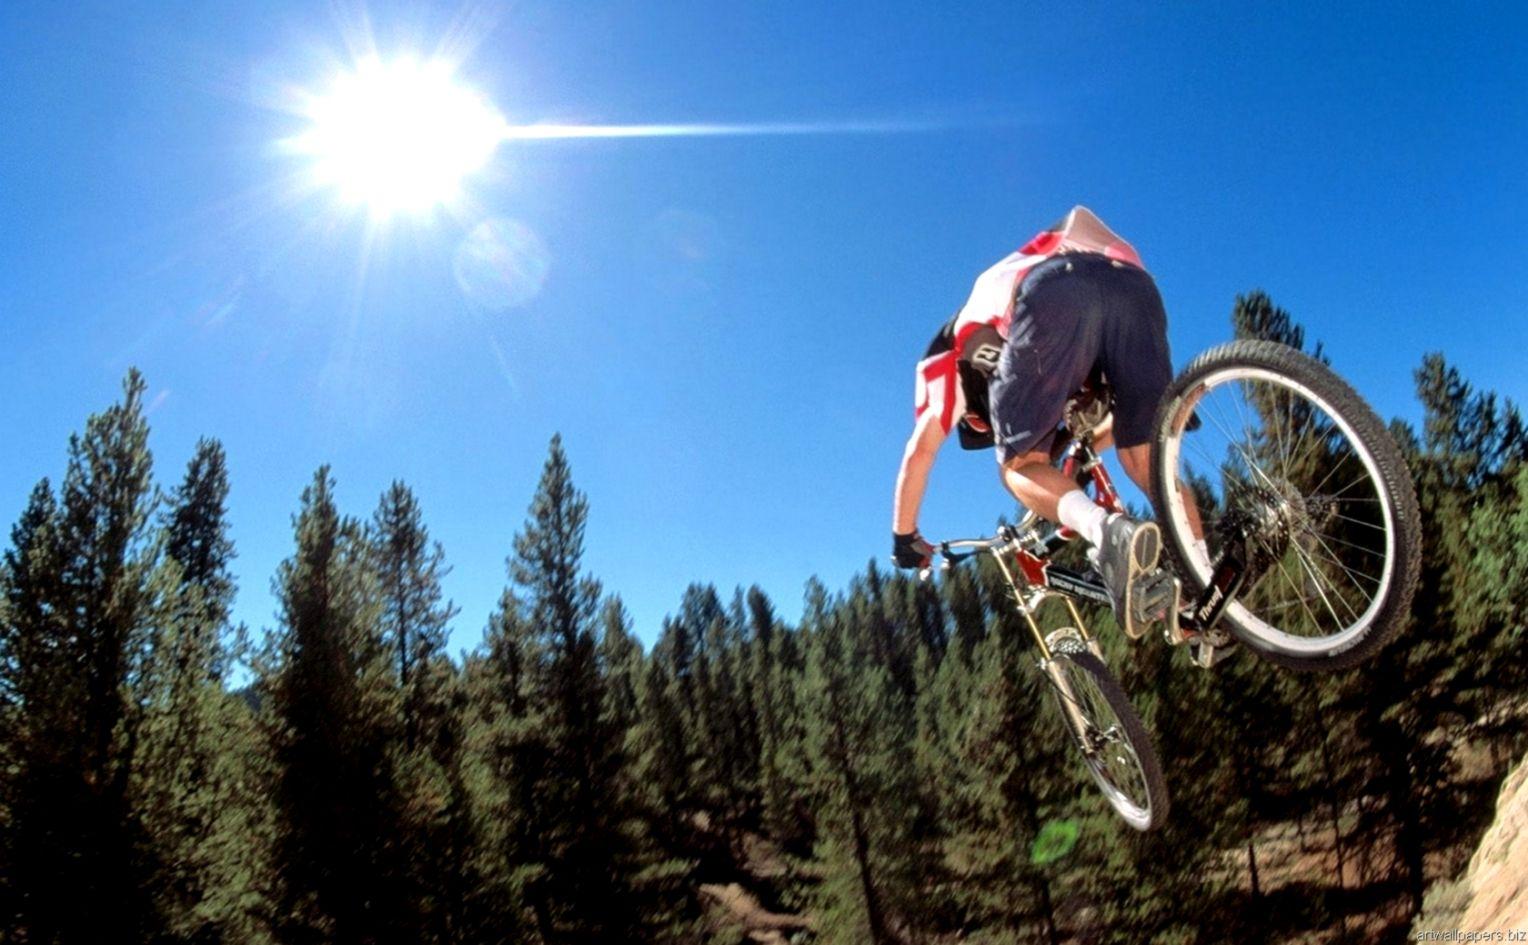 mountain cycle race hd